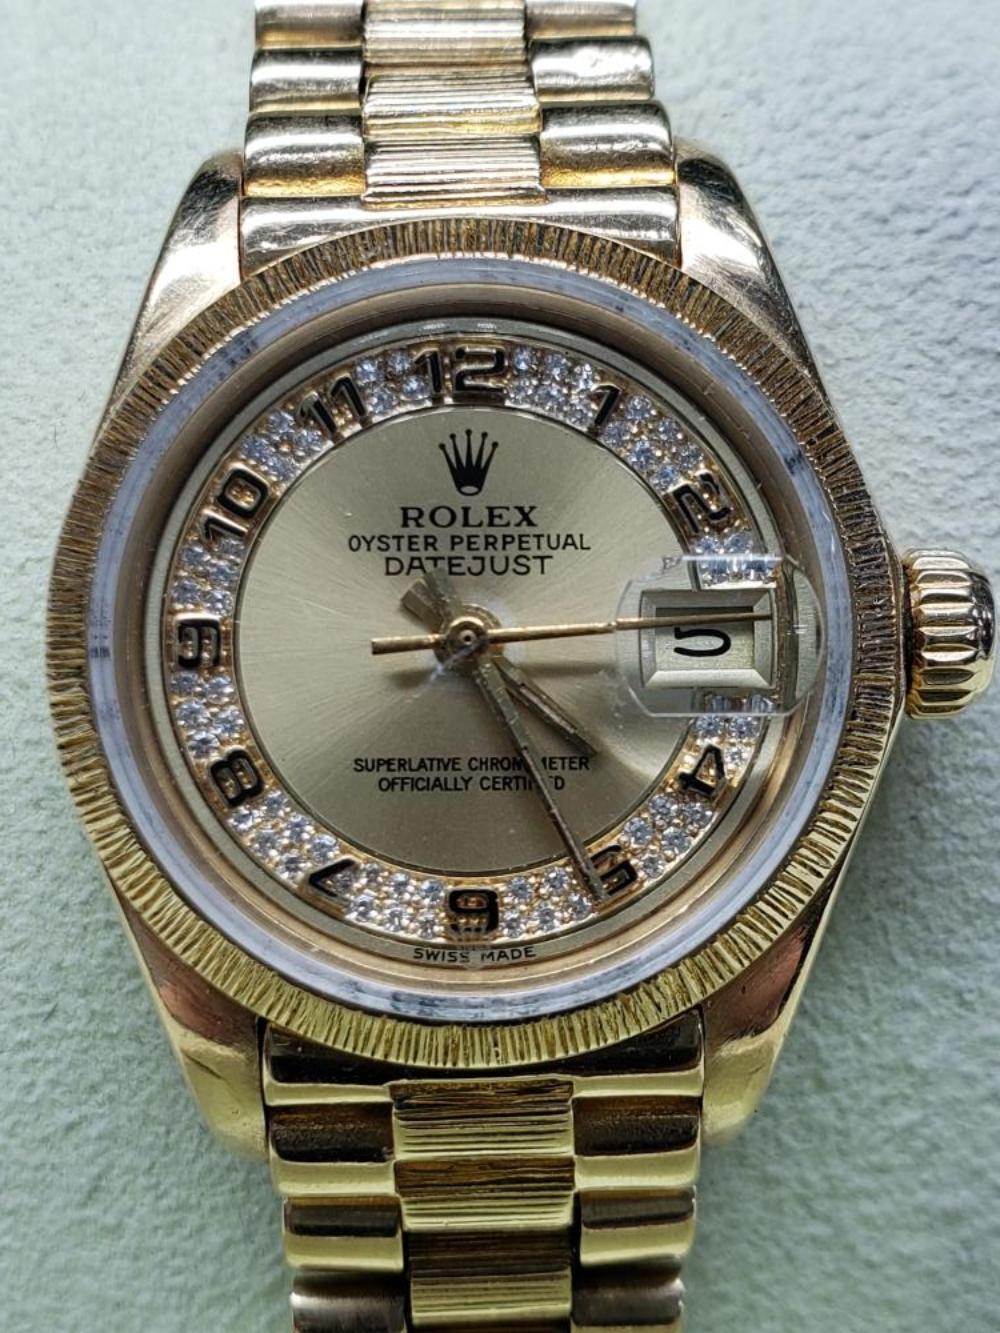 Rolex President Oyster Perpetual DateJust 18k Yellow Gold Myriad Diamond Dial Watch